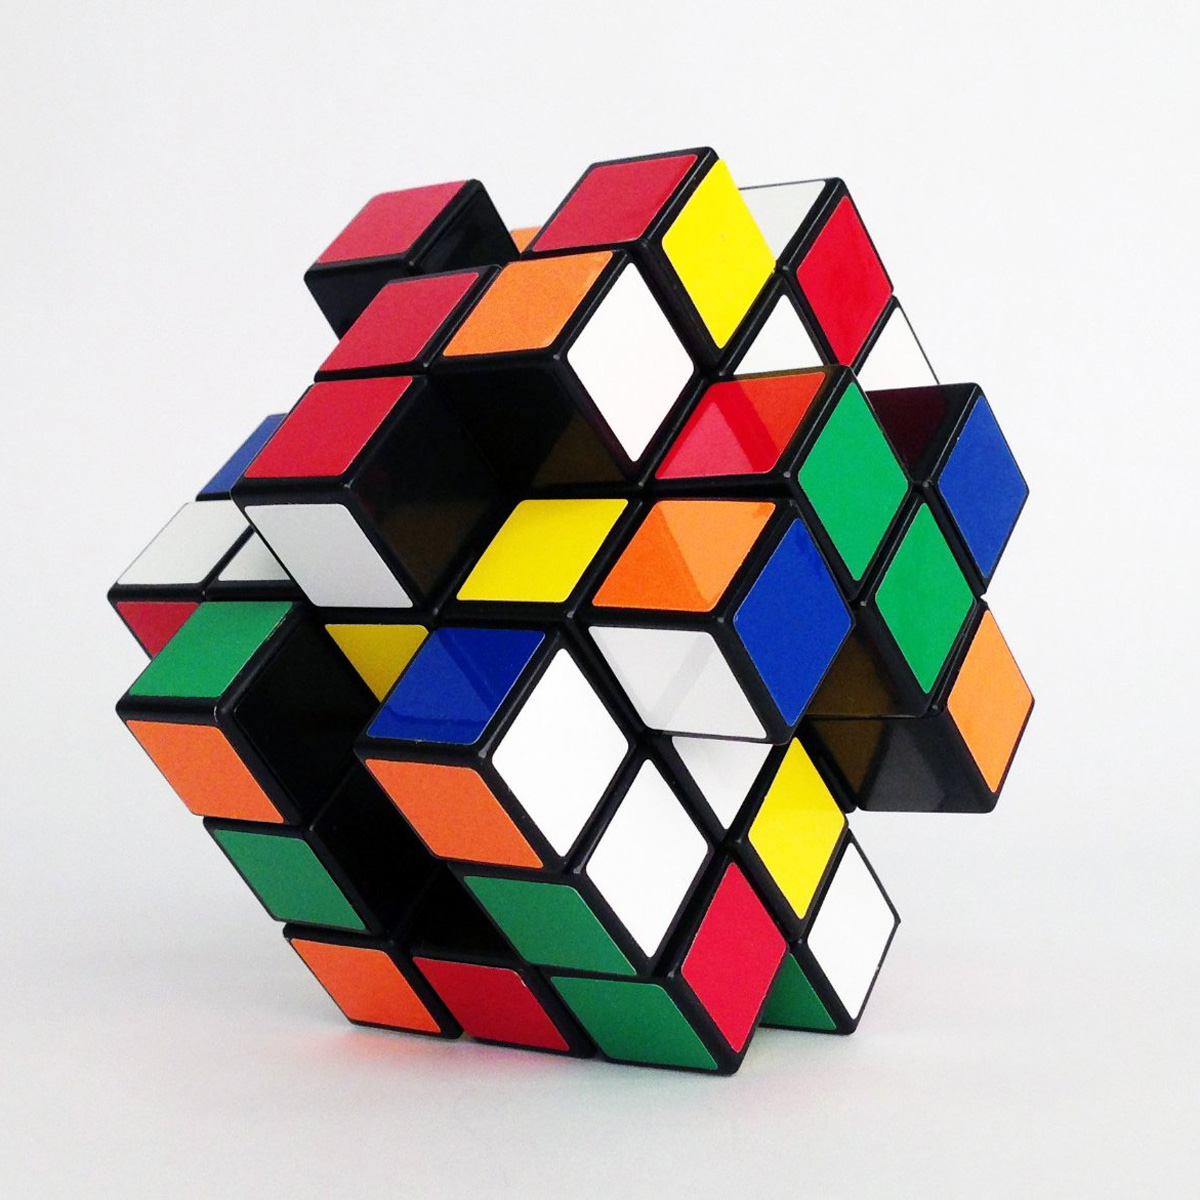 X-Cube Twisting Logic Puzzle - The Green Head